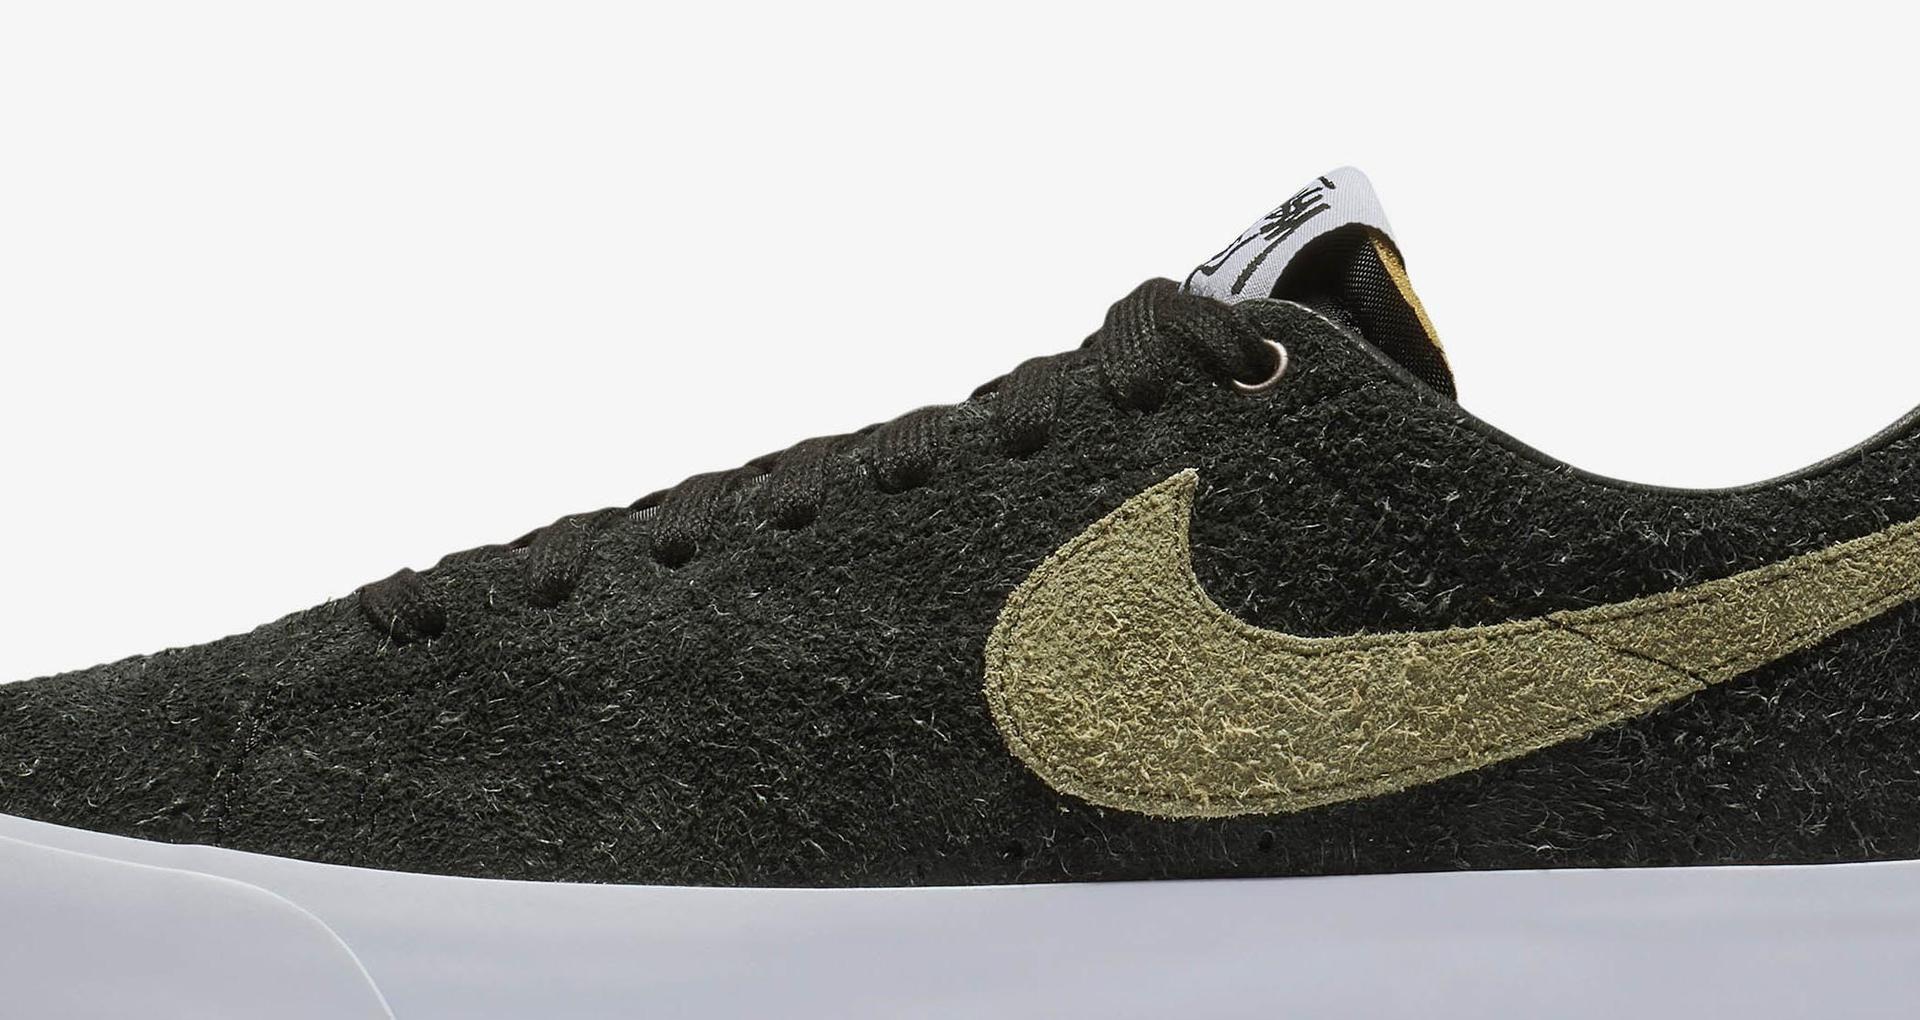 promo code 8be03 868eb Nike SB Zoom Blazer Low Stussy x Terps 'Black & Reflect ...